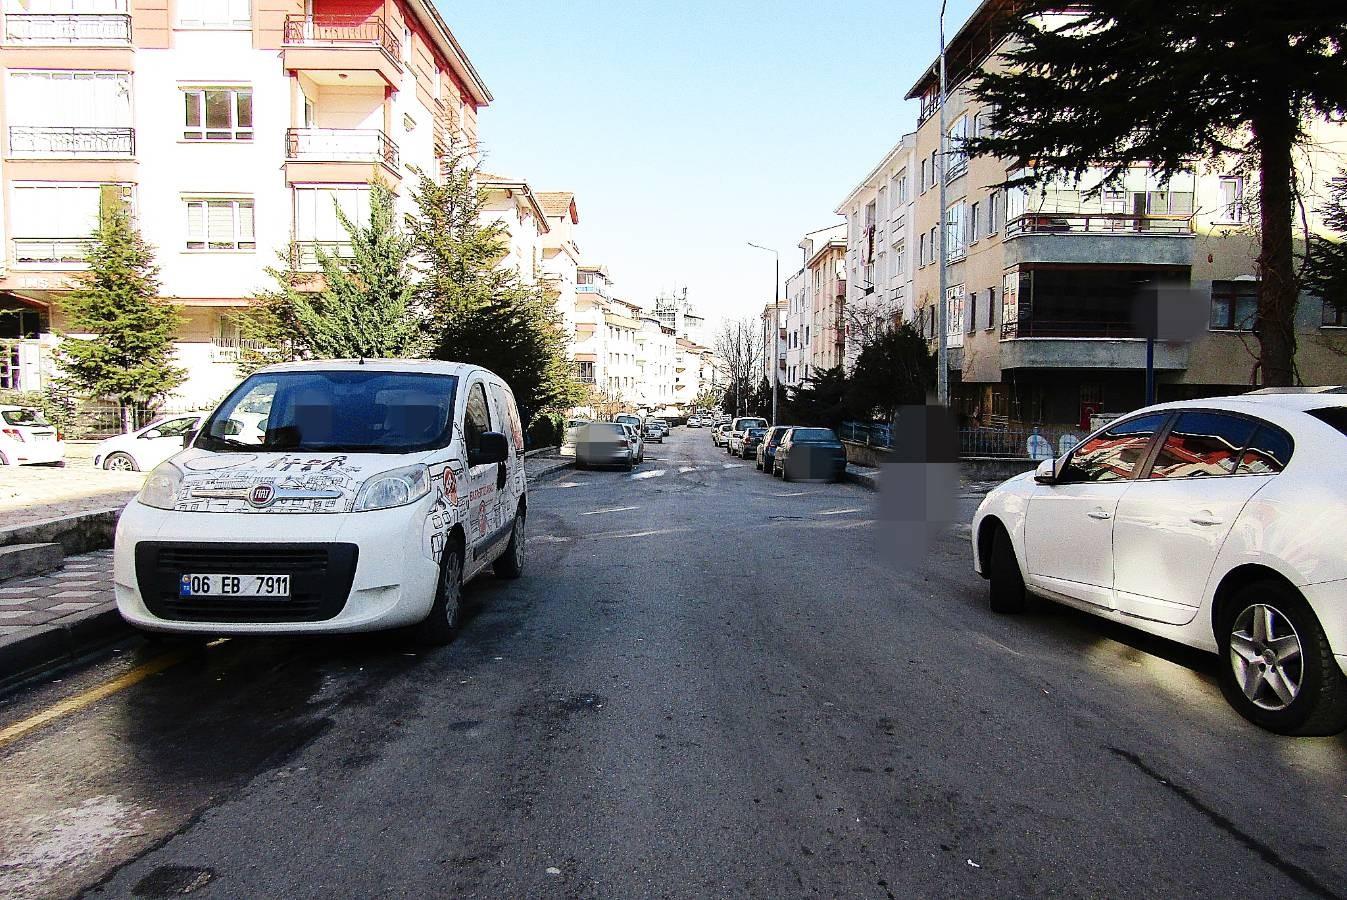 SR EMLAK'TAN PİYADE MAH'DE 20m² CADDEYE YAKIN DEPOLU DÜKKAN